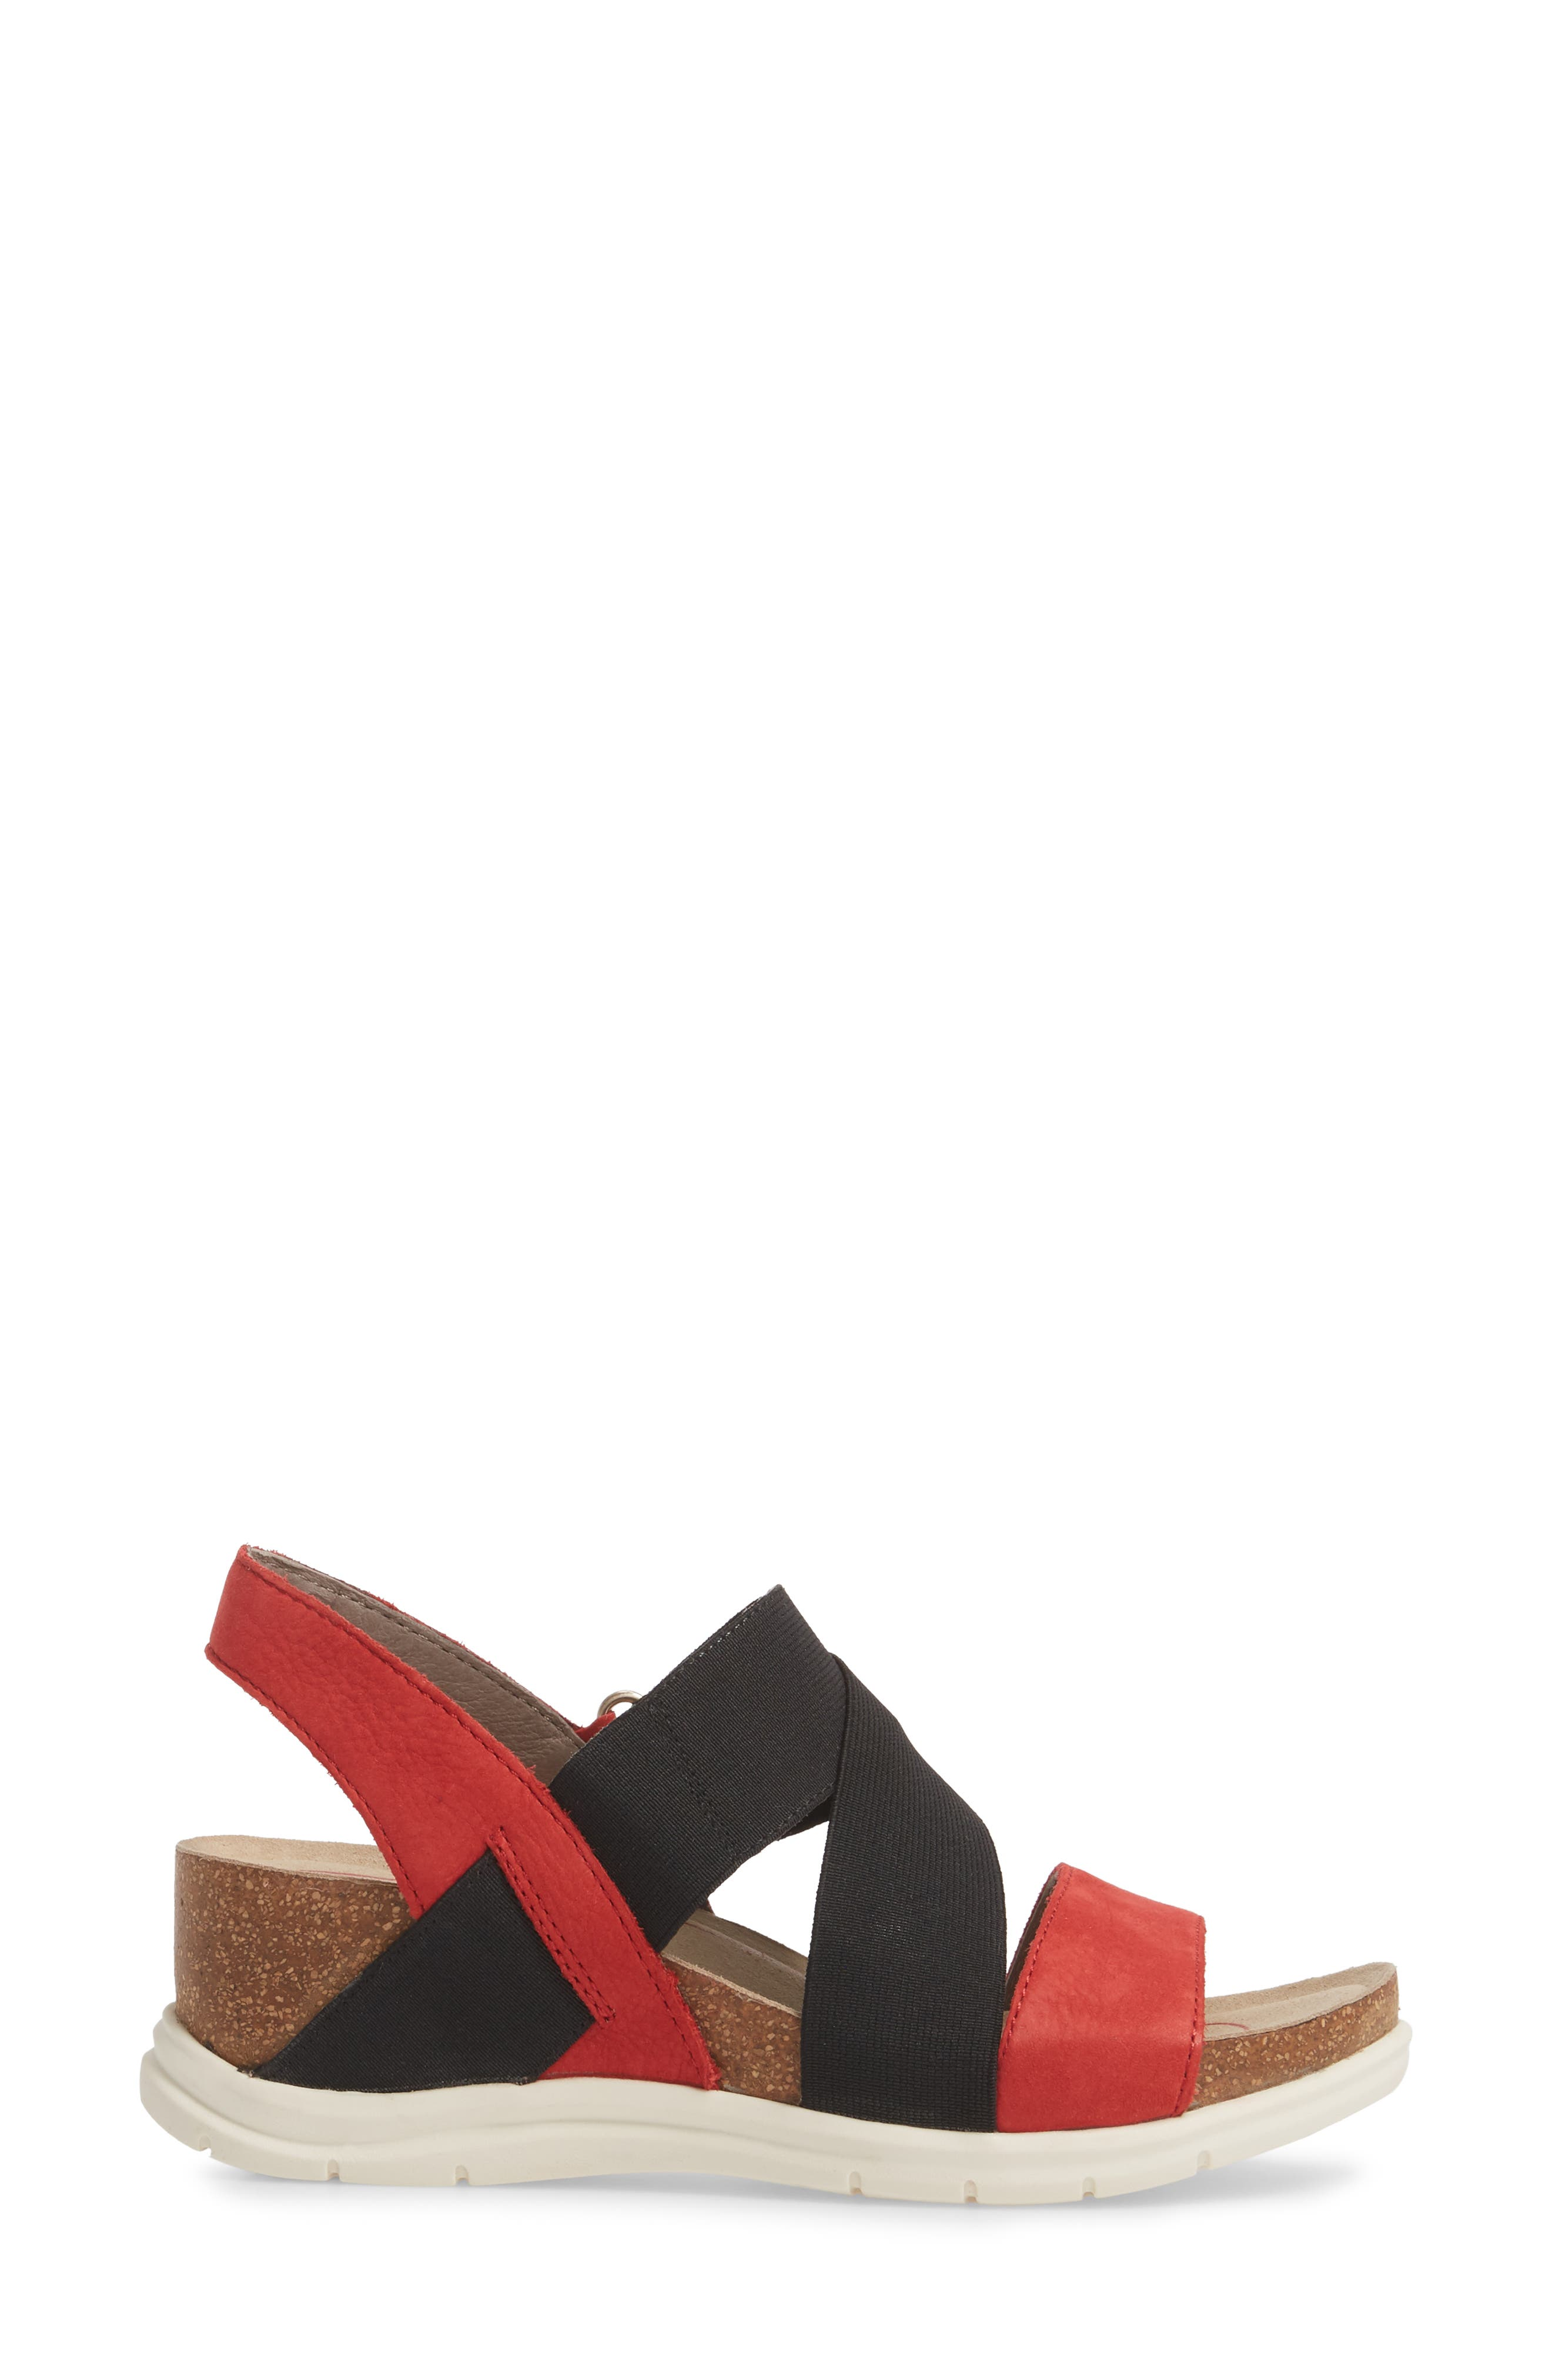 Paisley Wedge Sandal,                             Alternate thumbnail 12, color,